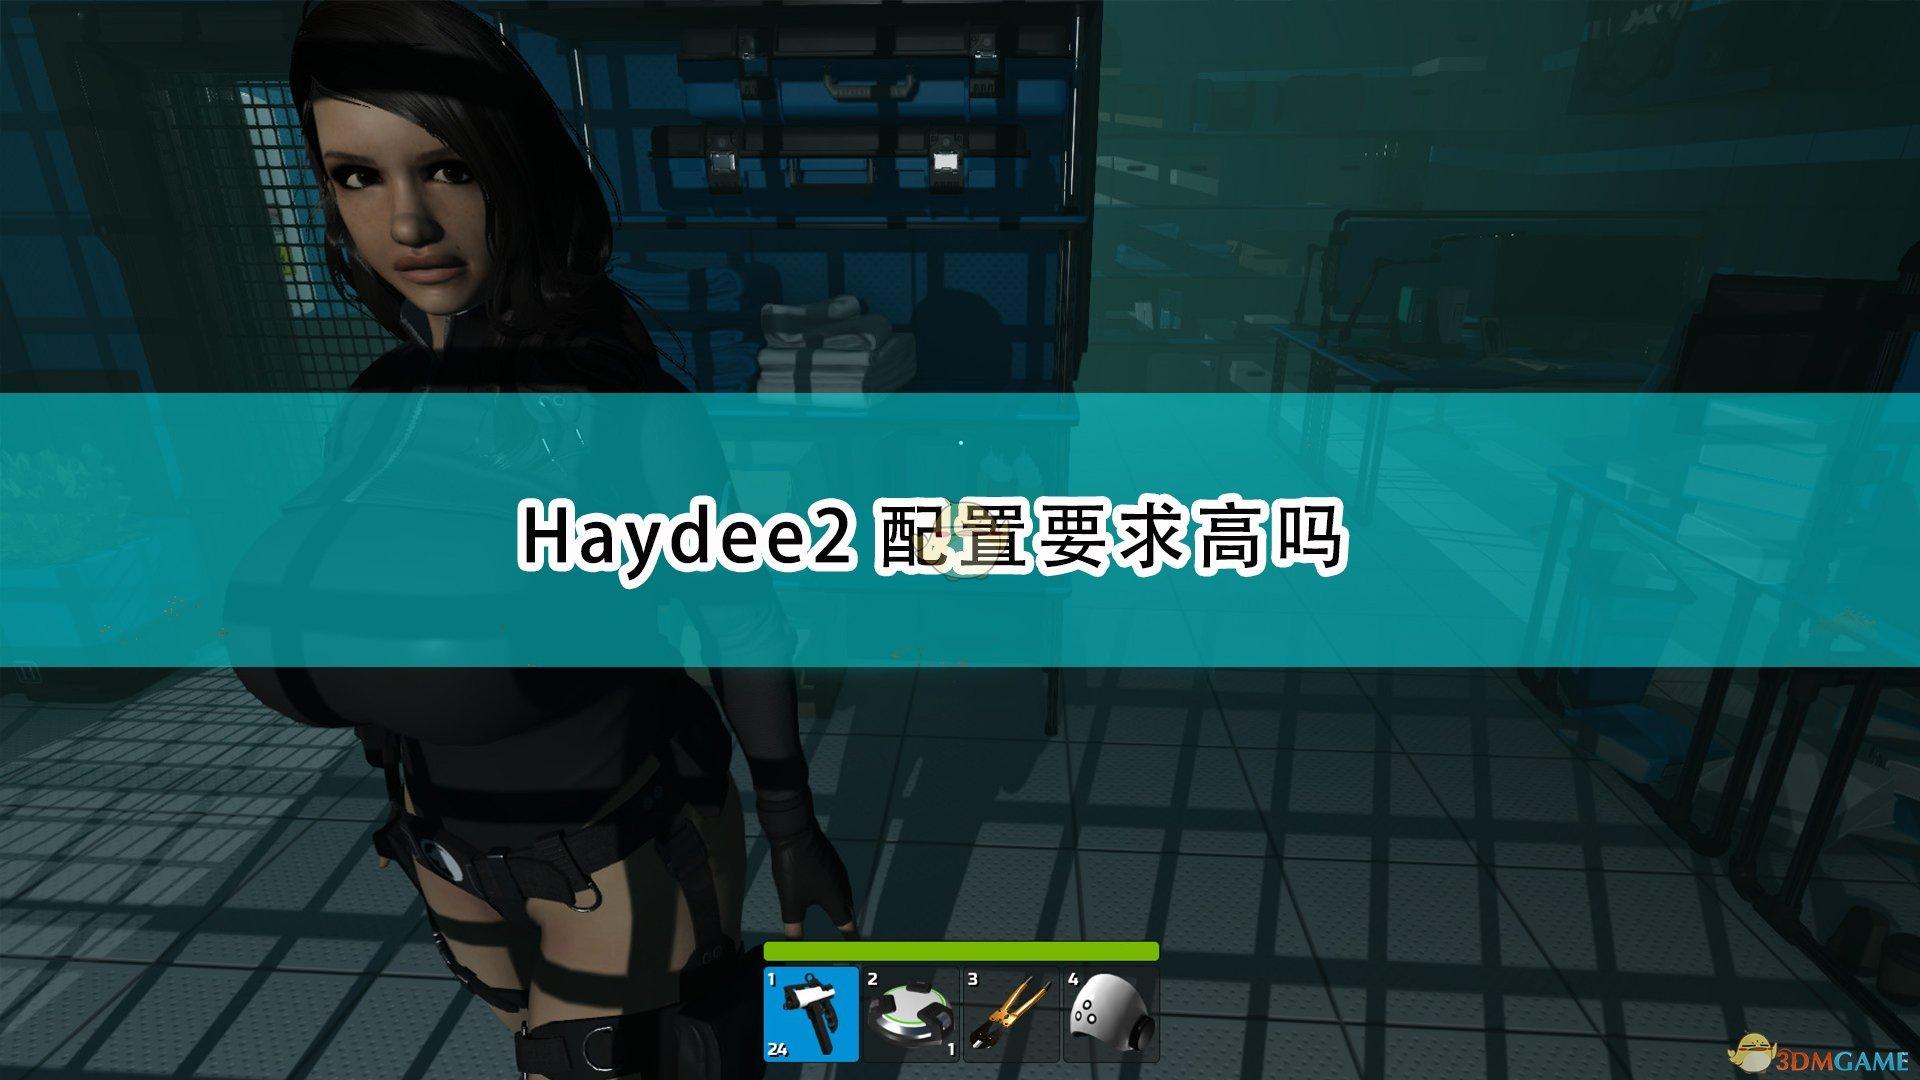 《Haydee 2》配置要求一览表